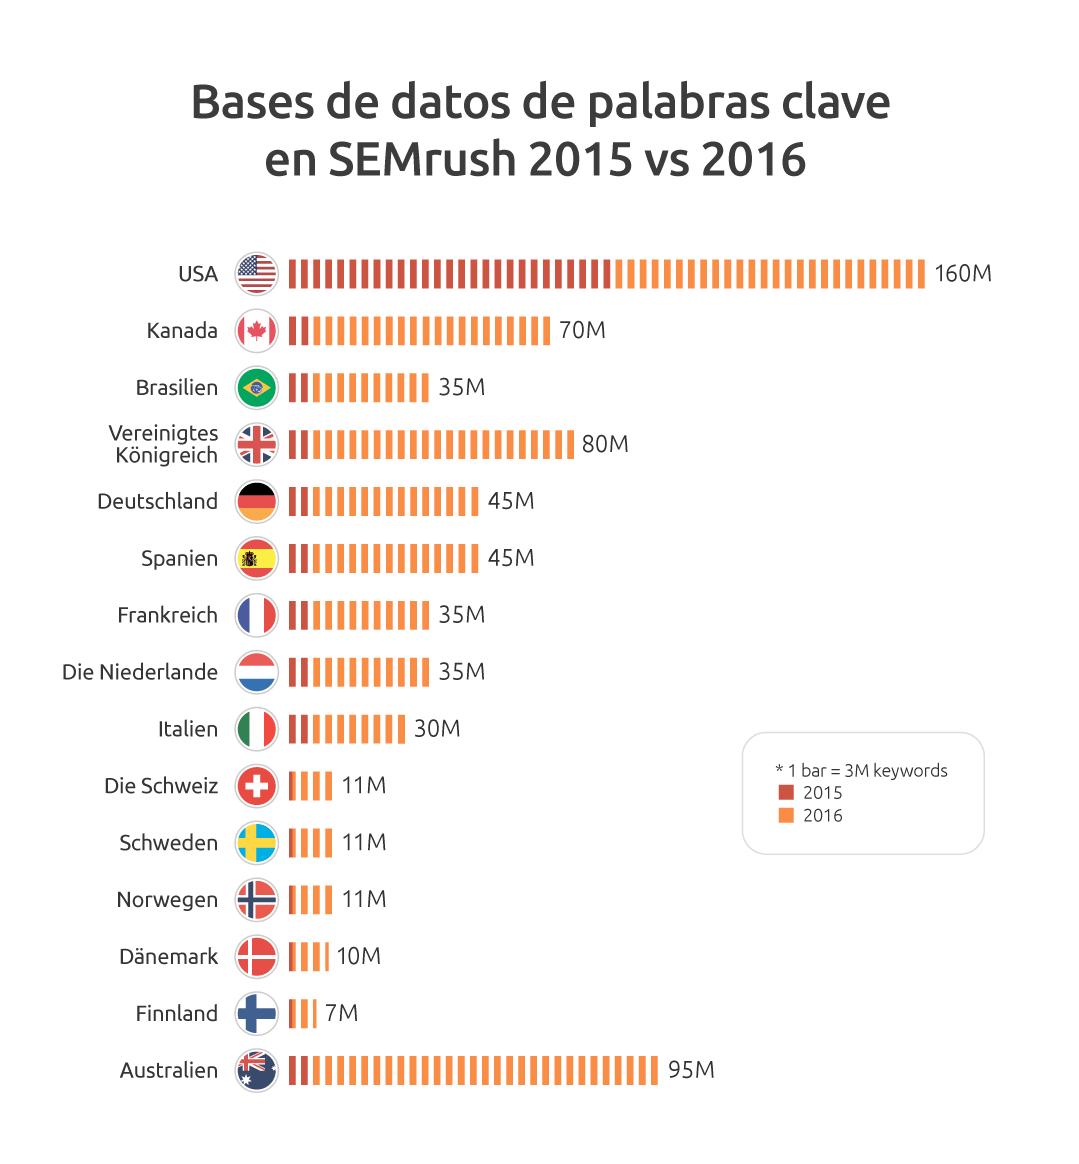 Bases de datos de palabras clave - 2015 vs 2016